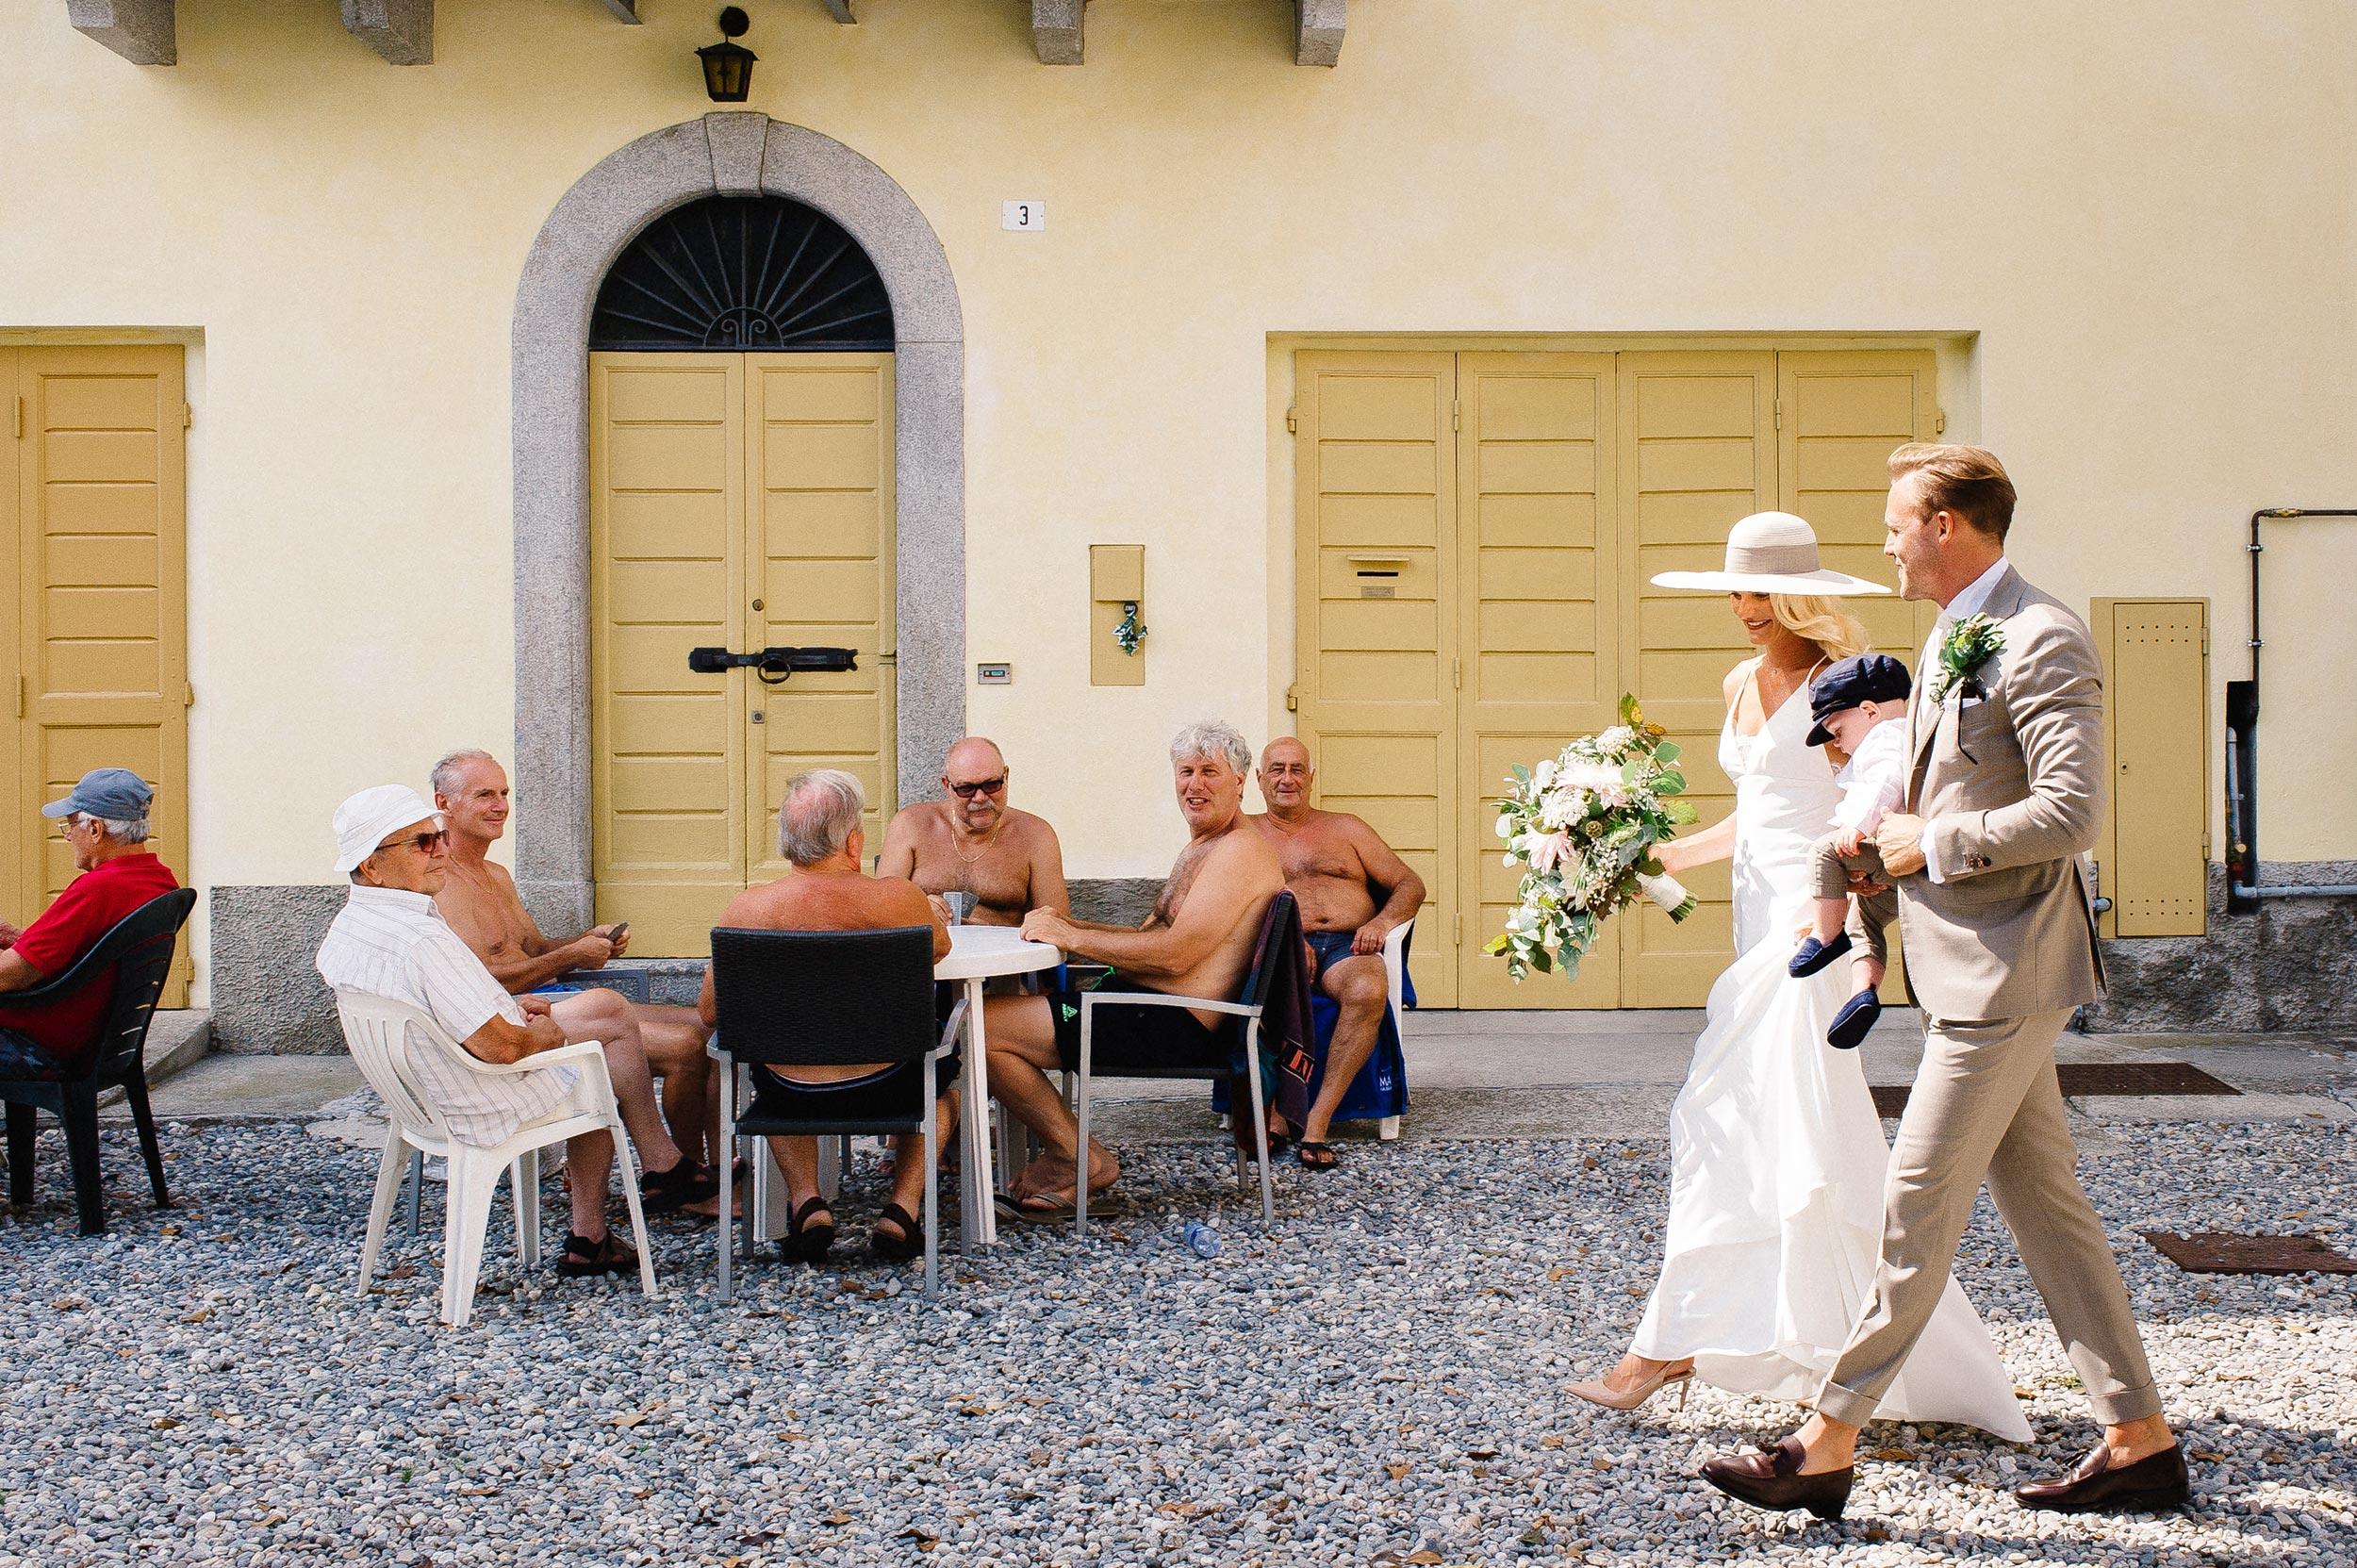 2018-Villa-Regina-Teodolinda-Lake-Como-Wedding-Photographer-Italy-Alessandro-Avenali-132.jpg